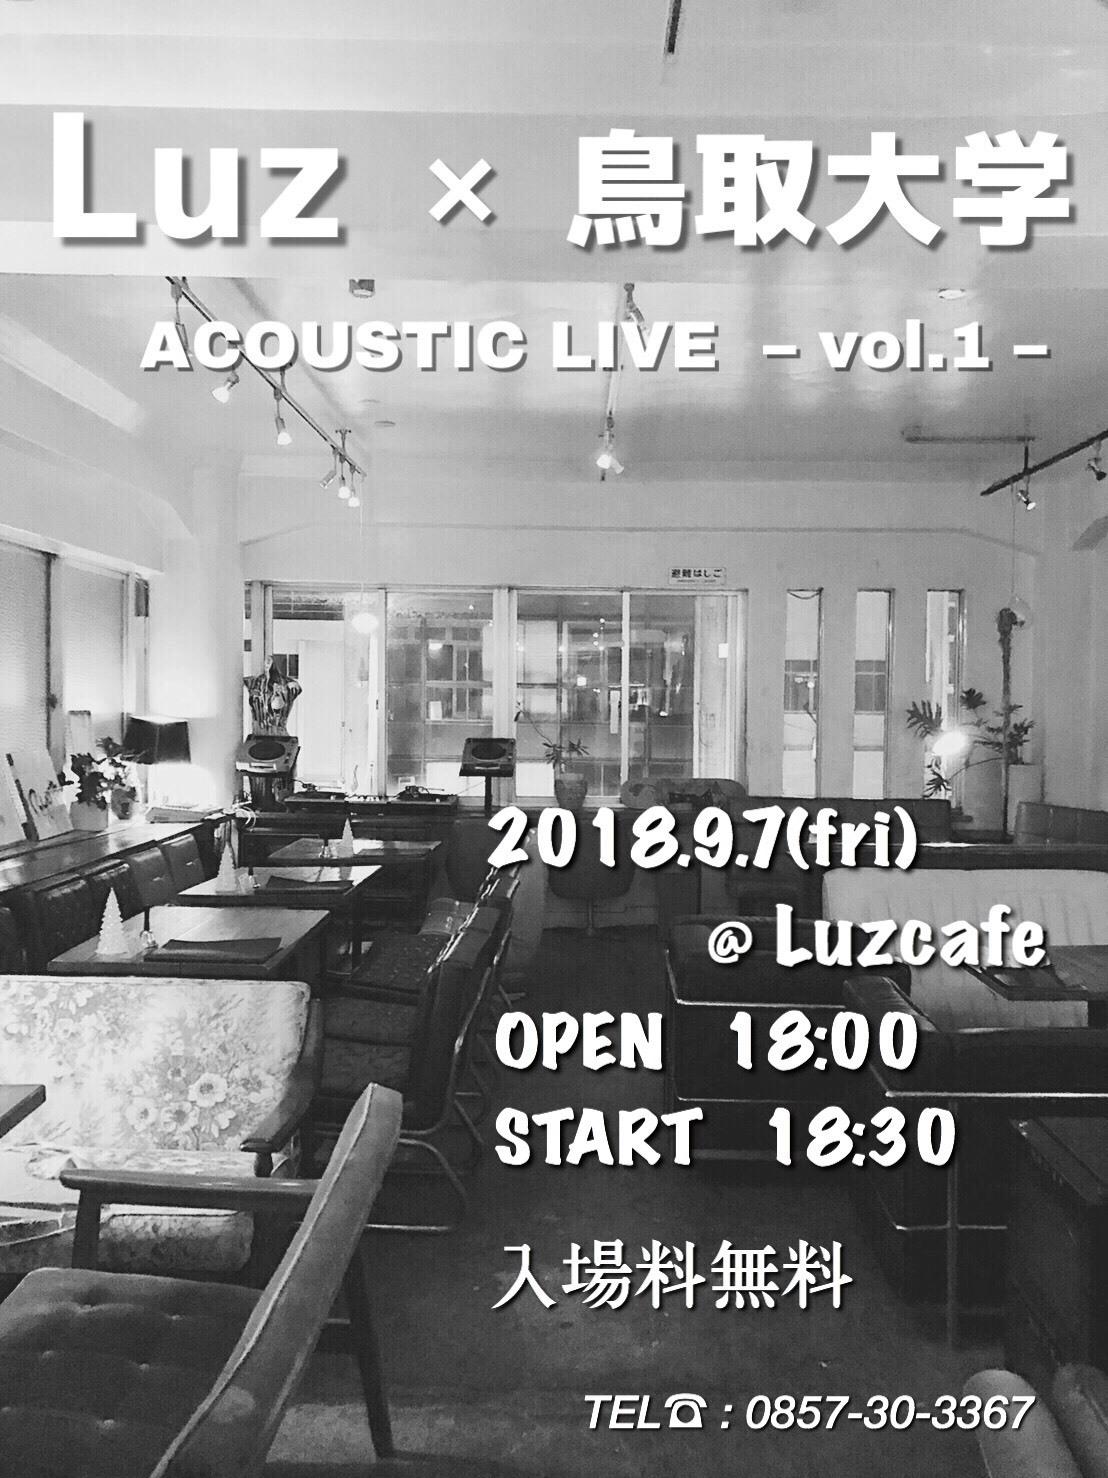 Luz × 鳥取大学 ACOUSTIC LIVE @Luzcafe  レポ_e0115904_13262019.jpg